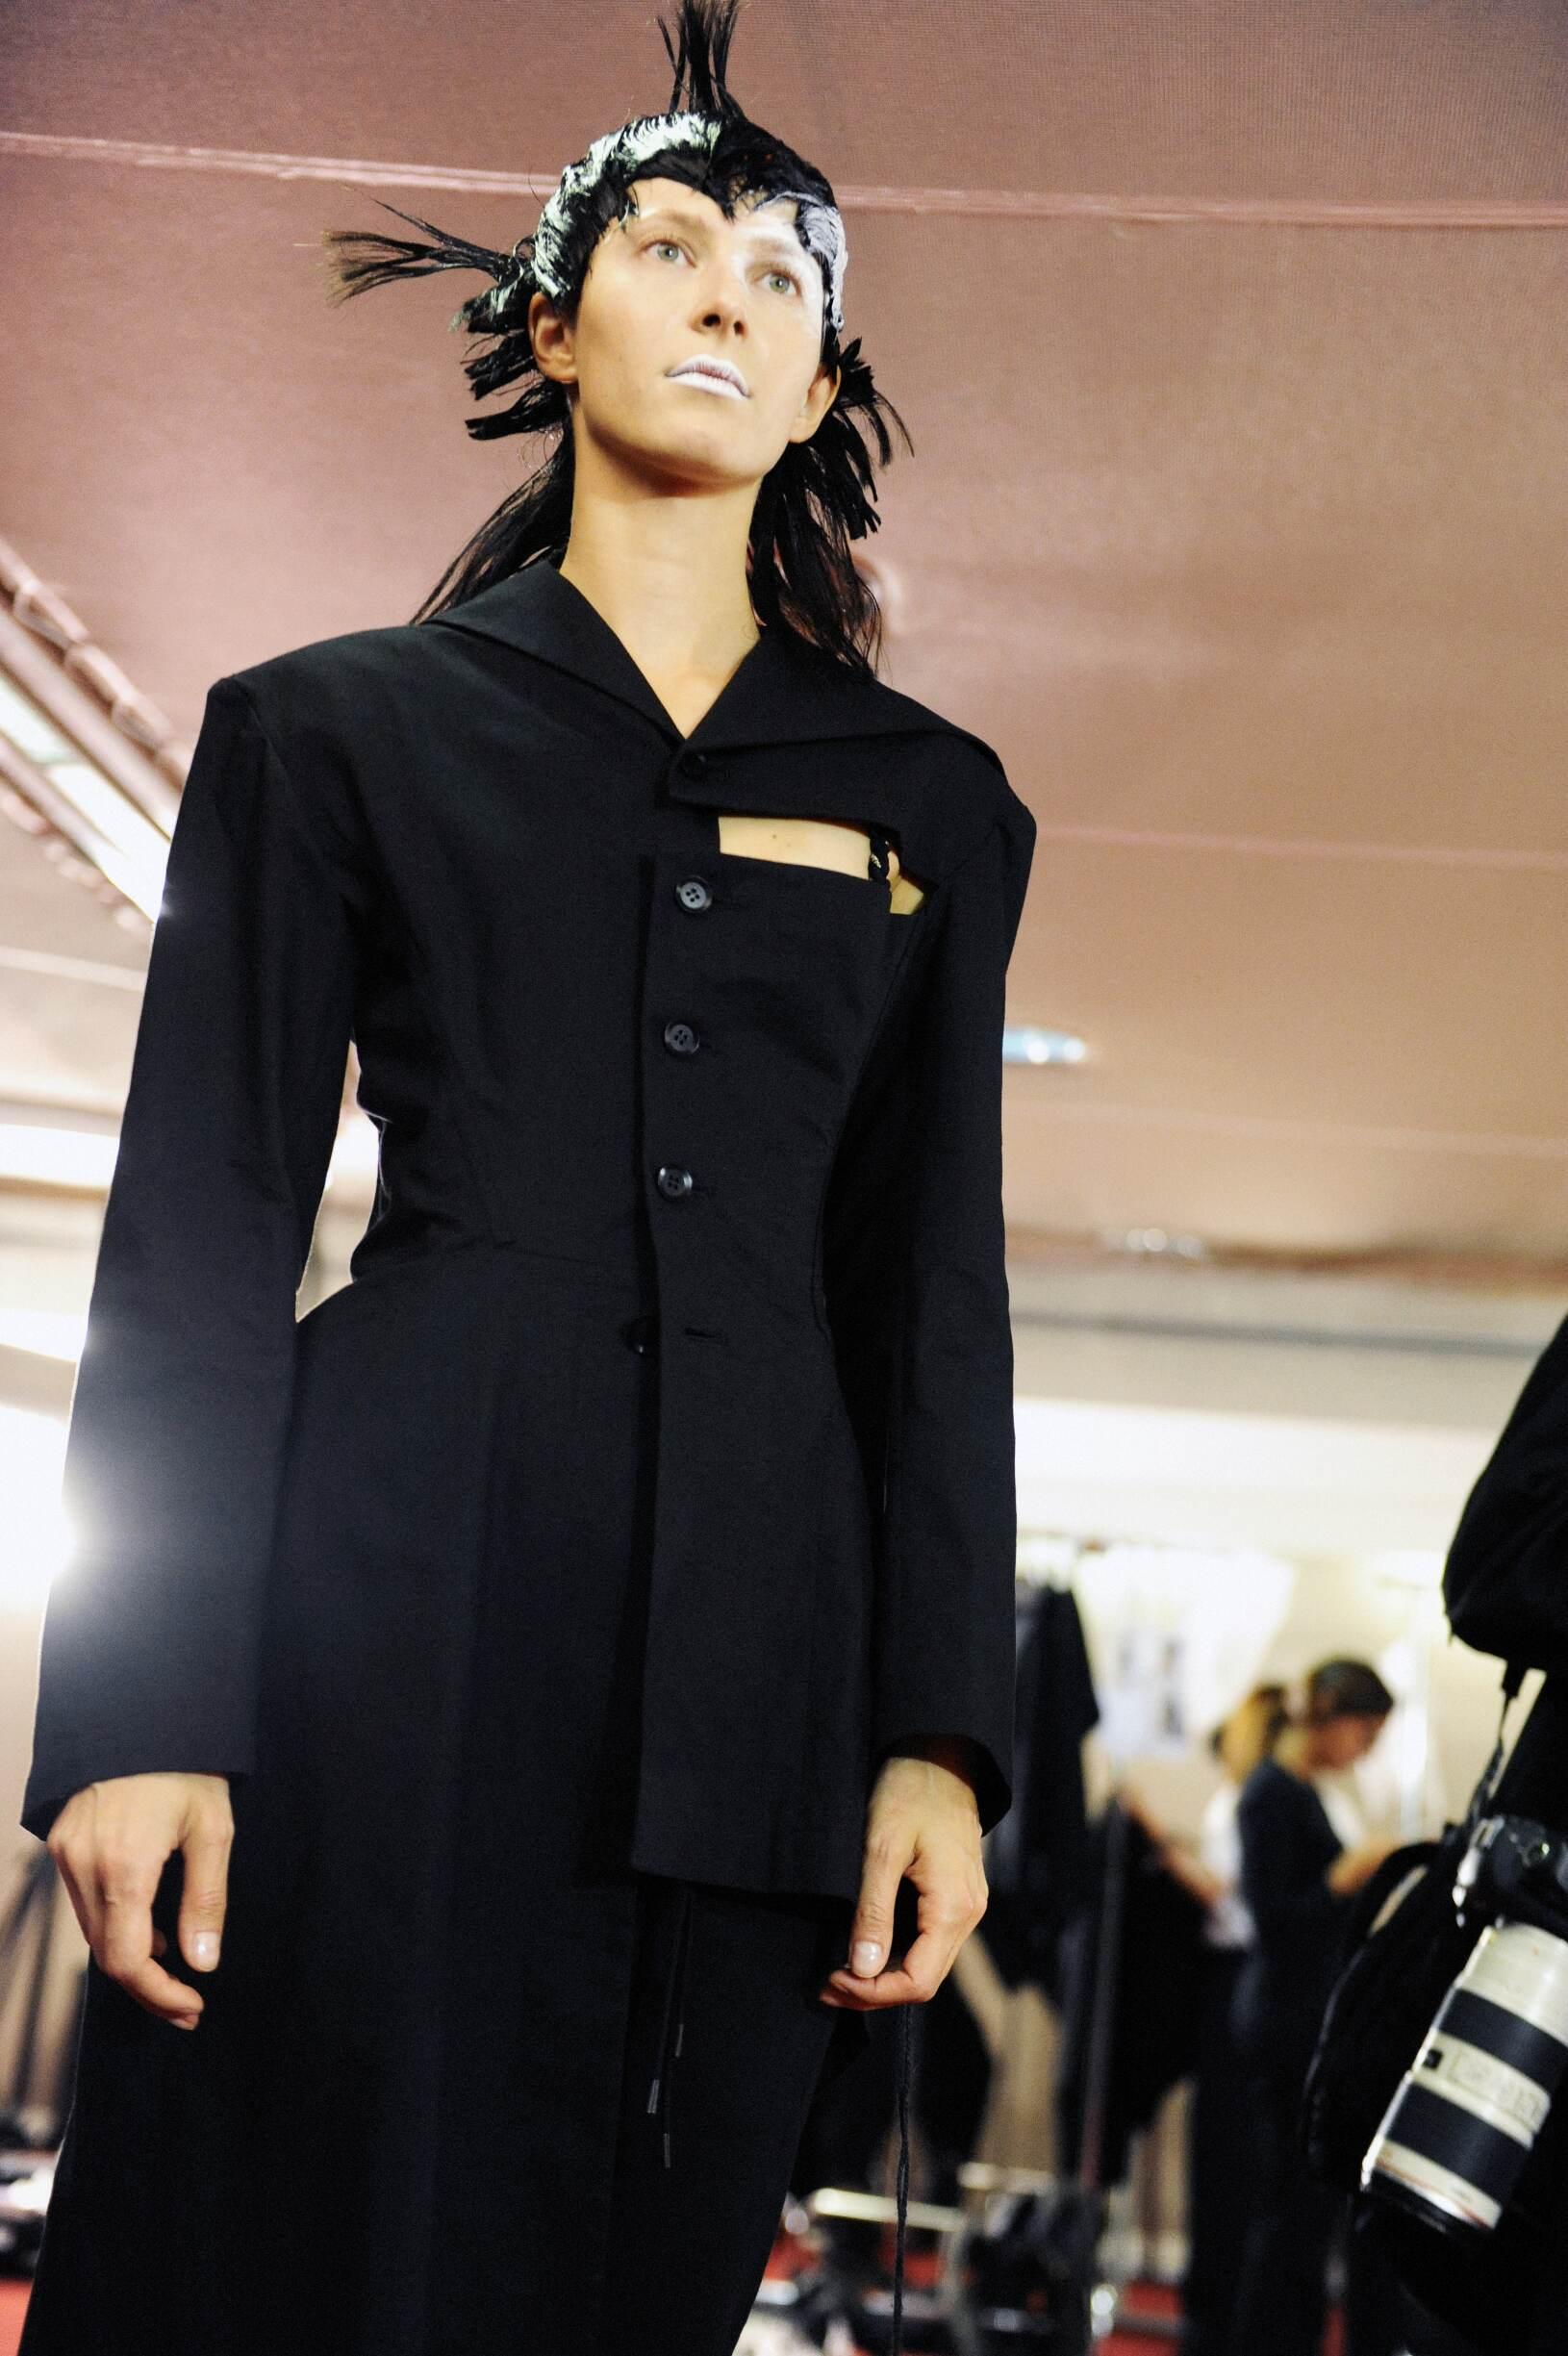 Backstage Yohji Yamamoto Fashion Show Model